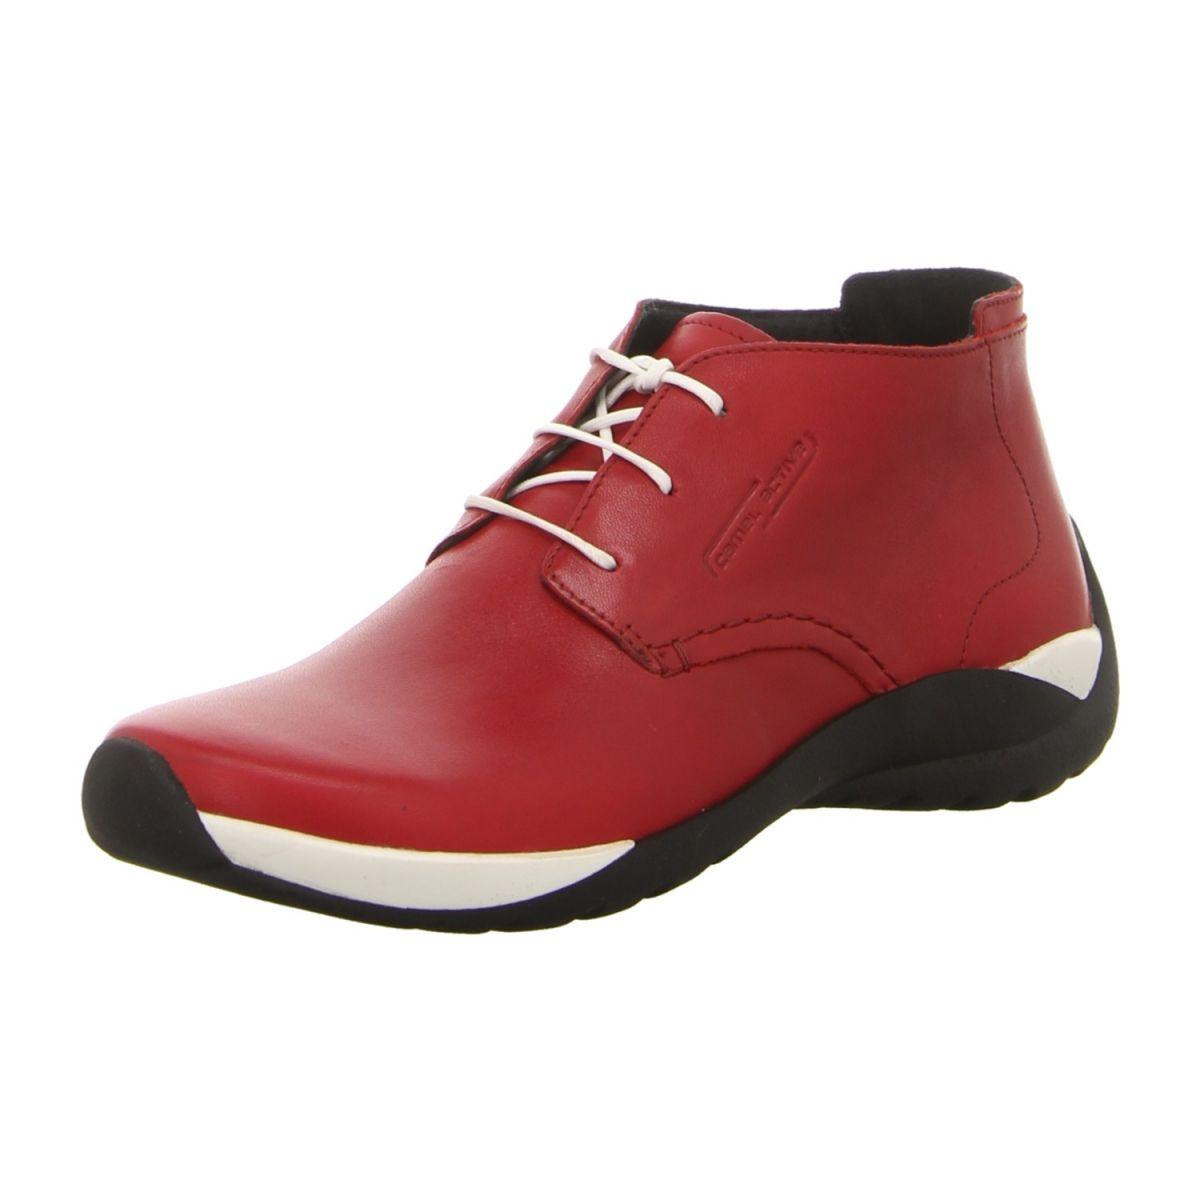 Pin auf Schuhe & Accessoires